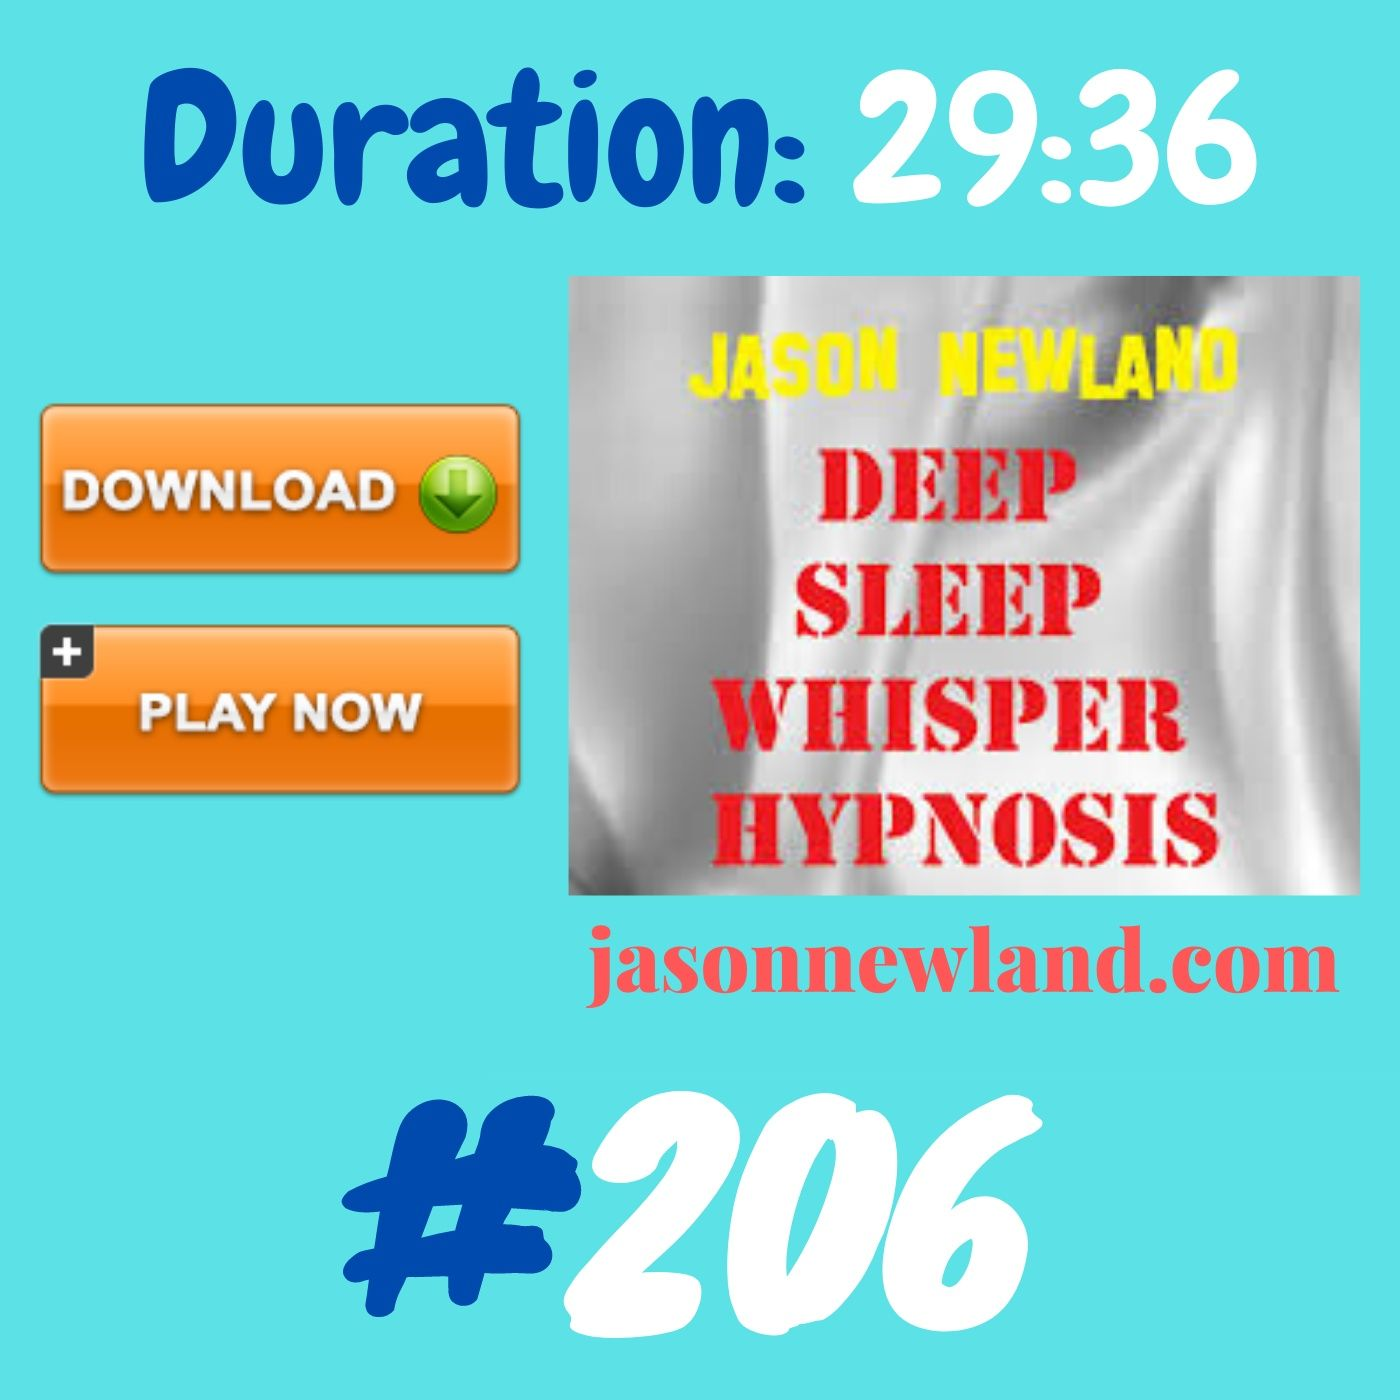 #362 Deep Sleep Whisper Hypnosis (Jason Newland) with MUSIC